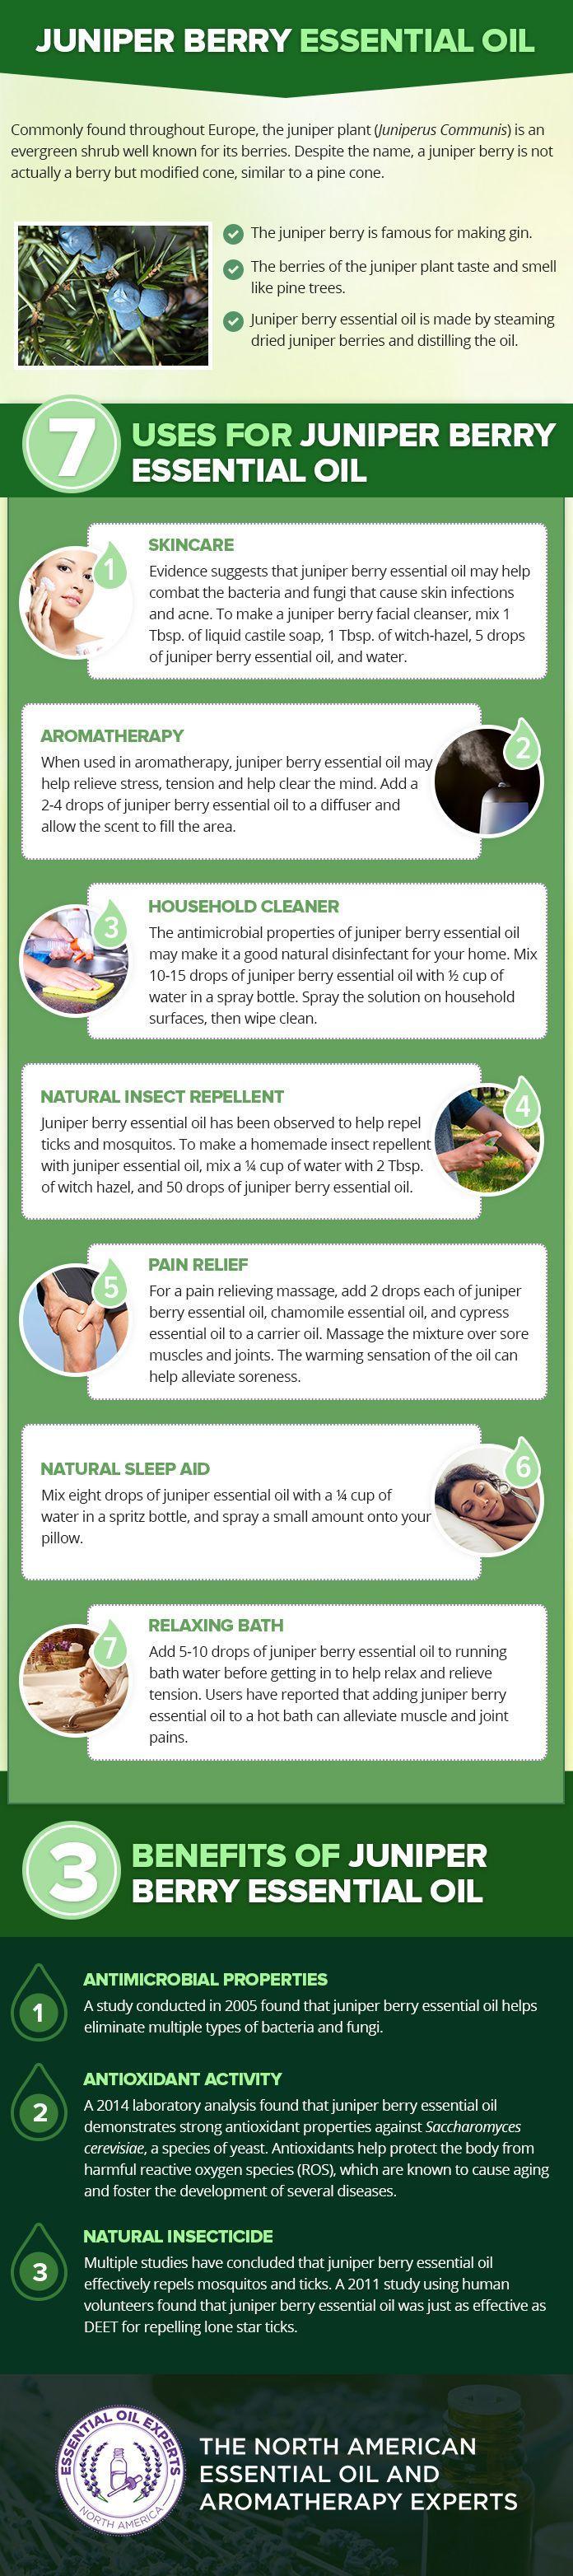 how to make juniper berry oil